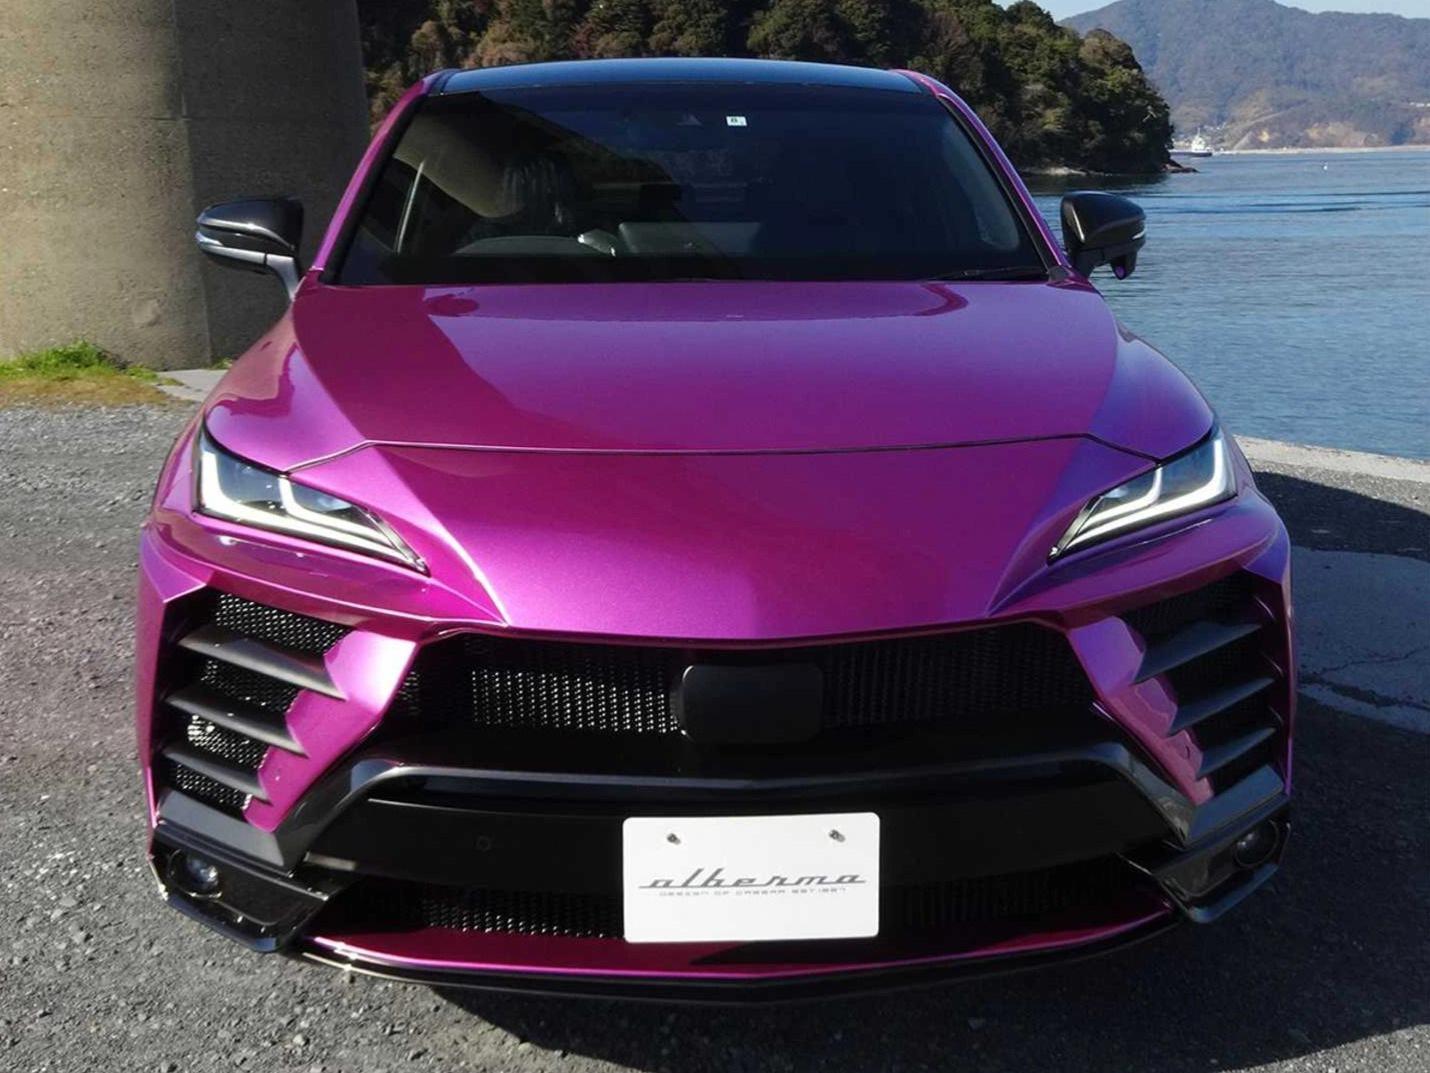 Hô biến Toyota Venza thành siêu xe Lamborghini Urus - 4